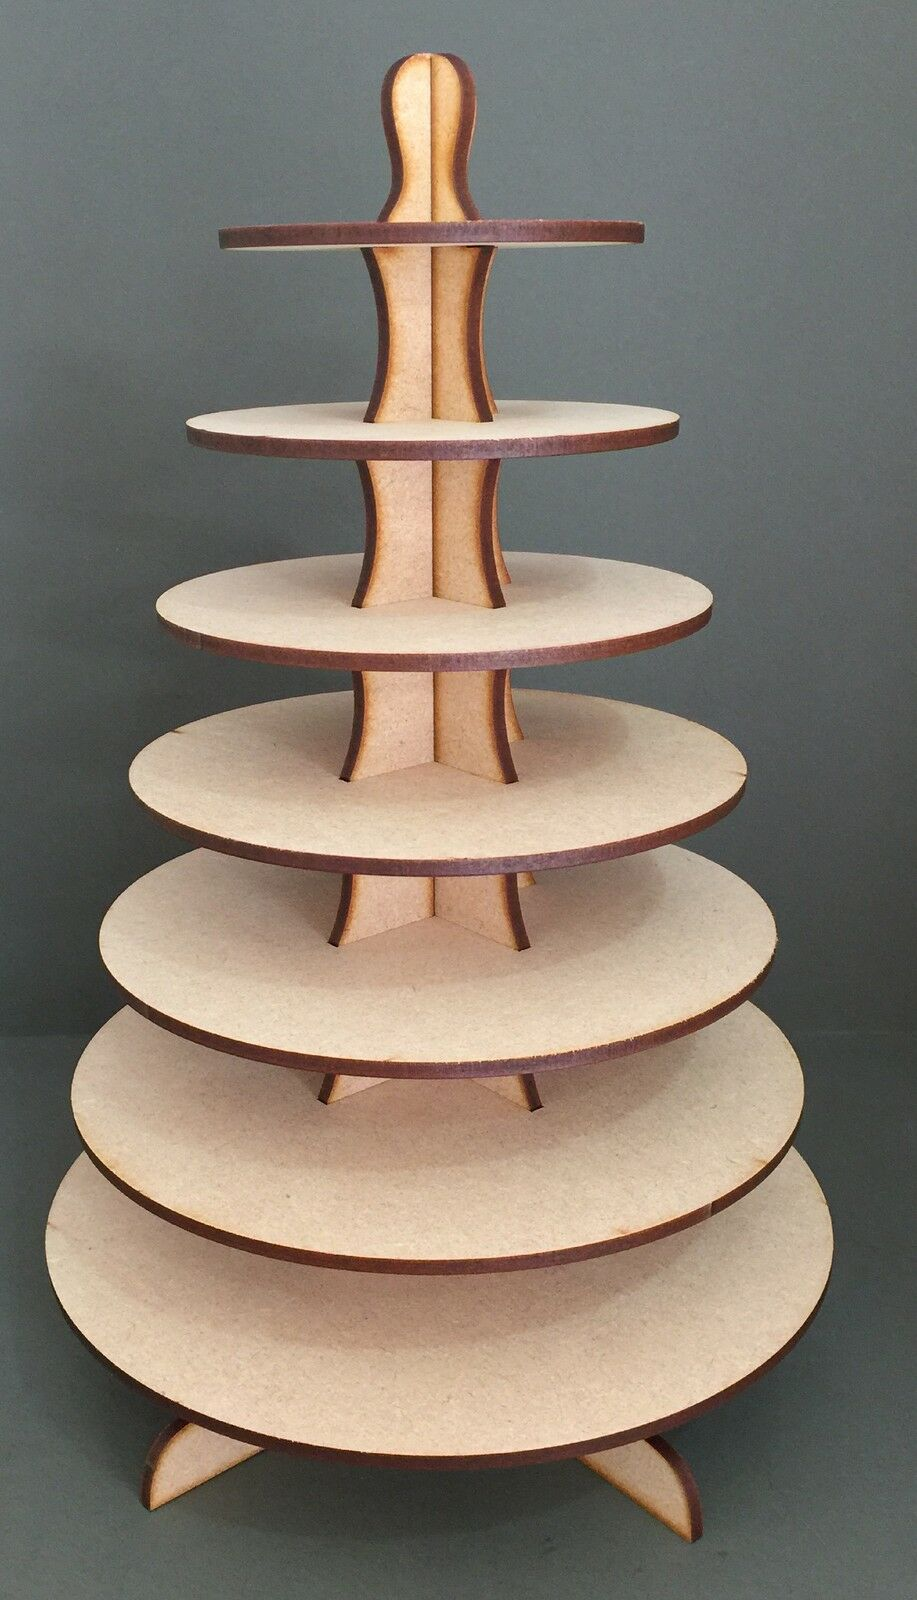 Y37A 80x WEDDING TABLE Chocolate Pyramid Ferrero Rocher Display Stand Mr & Mrs